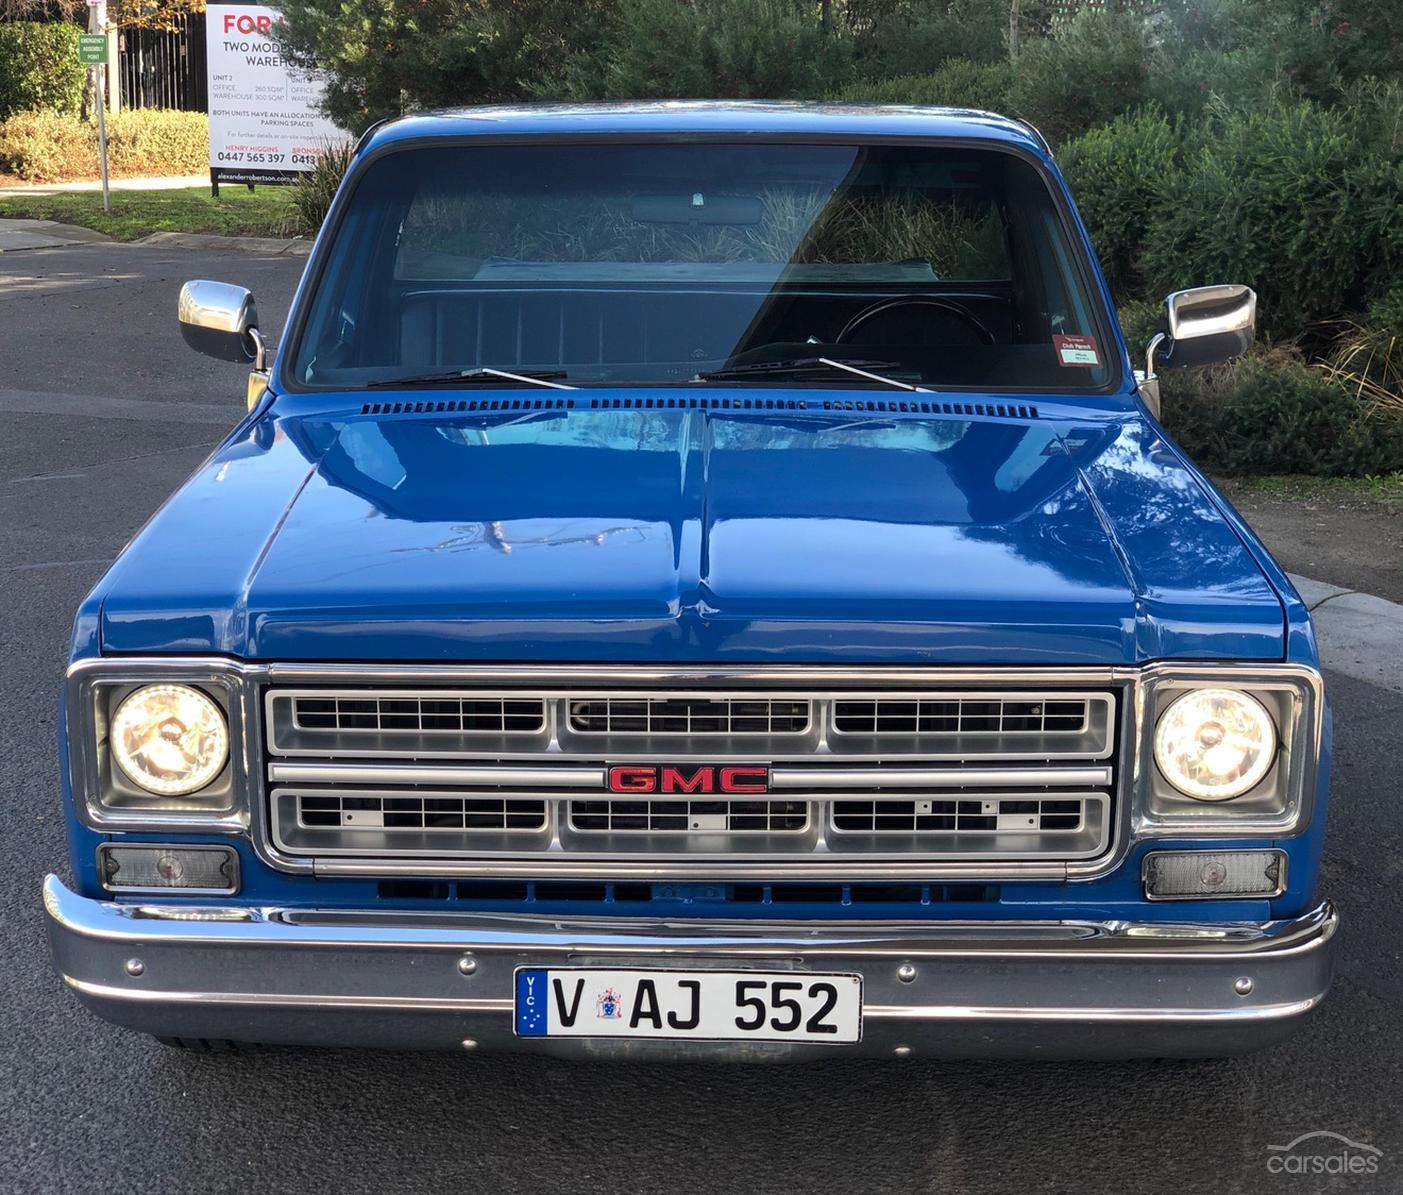 1976 GMC Pickup Auto-OAG-AD-17411304 - carsales com au